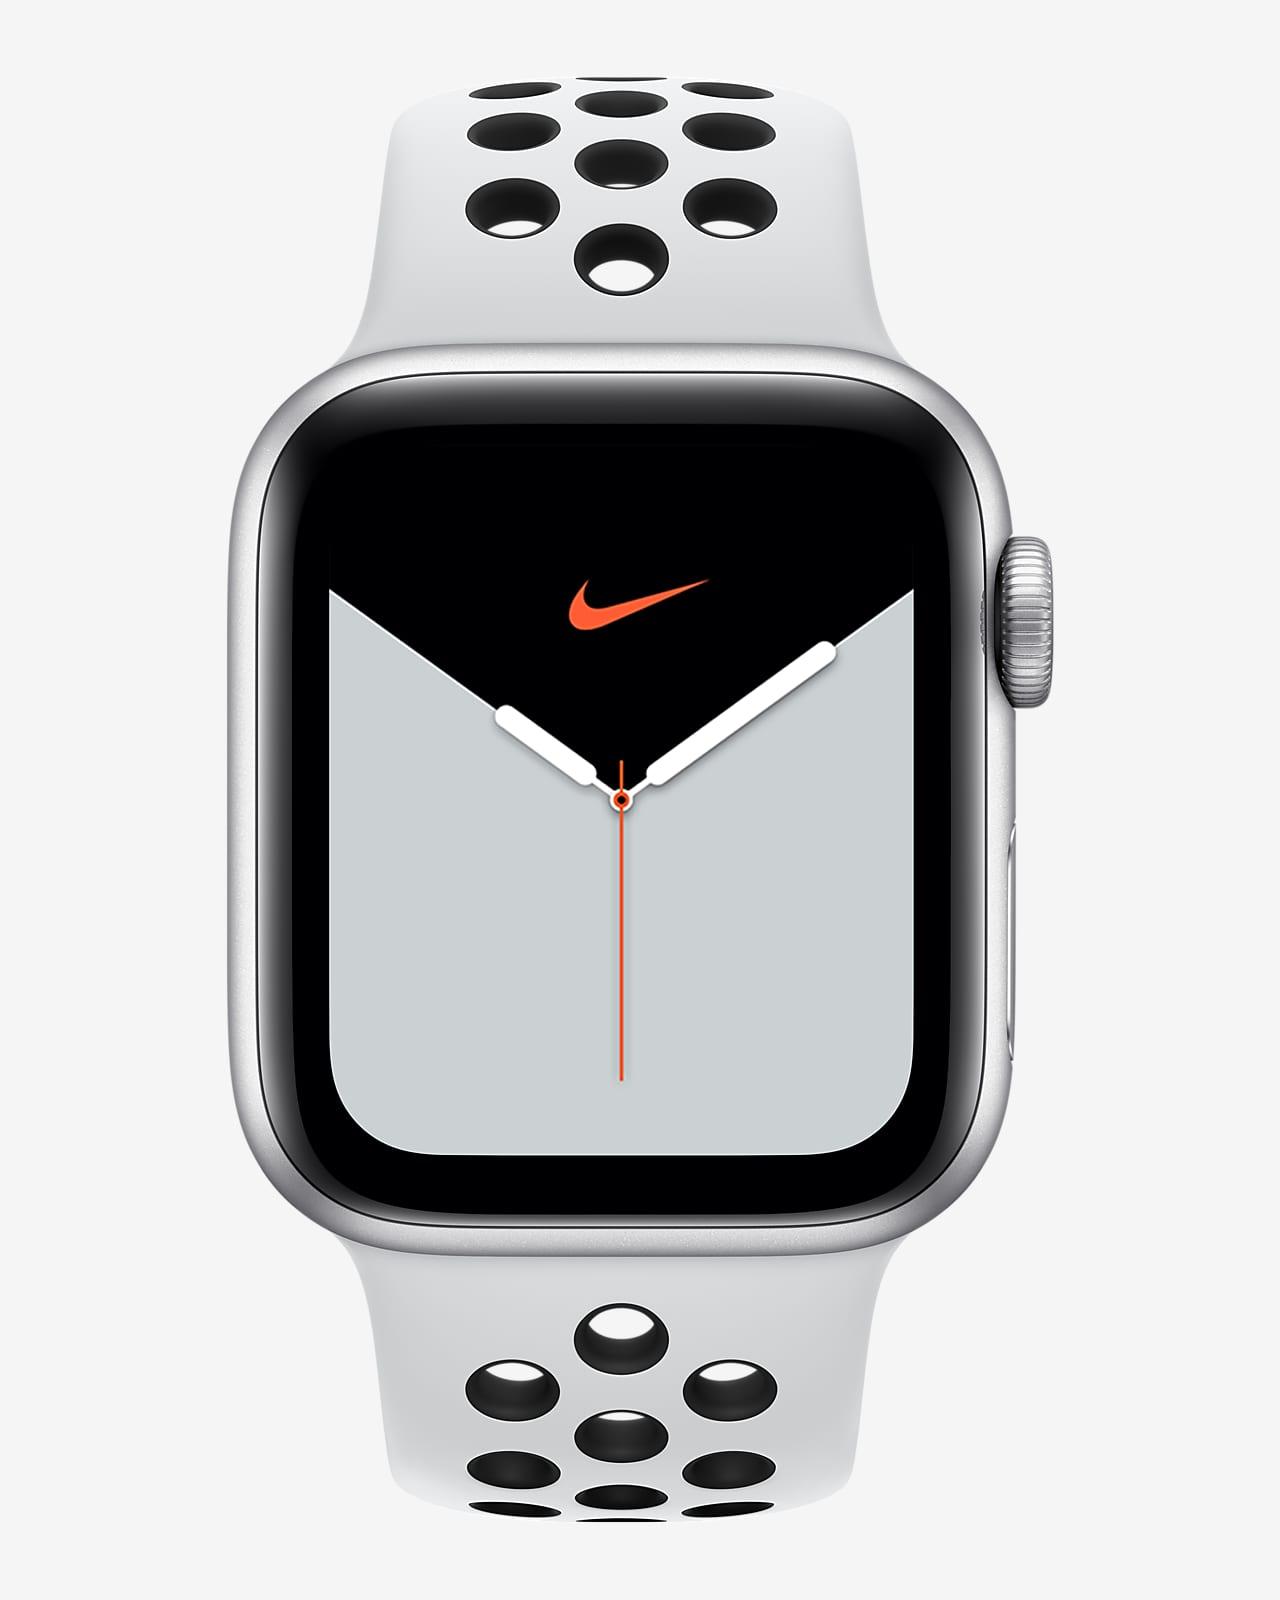 estéreo Tareas del hogar Viaje  Apple Watch Nike Series 5 (GPS + Cellular) with Nike Sport Band OpenBox  44mm Silver Aluminum Case. Nike.com